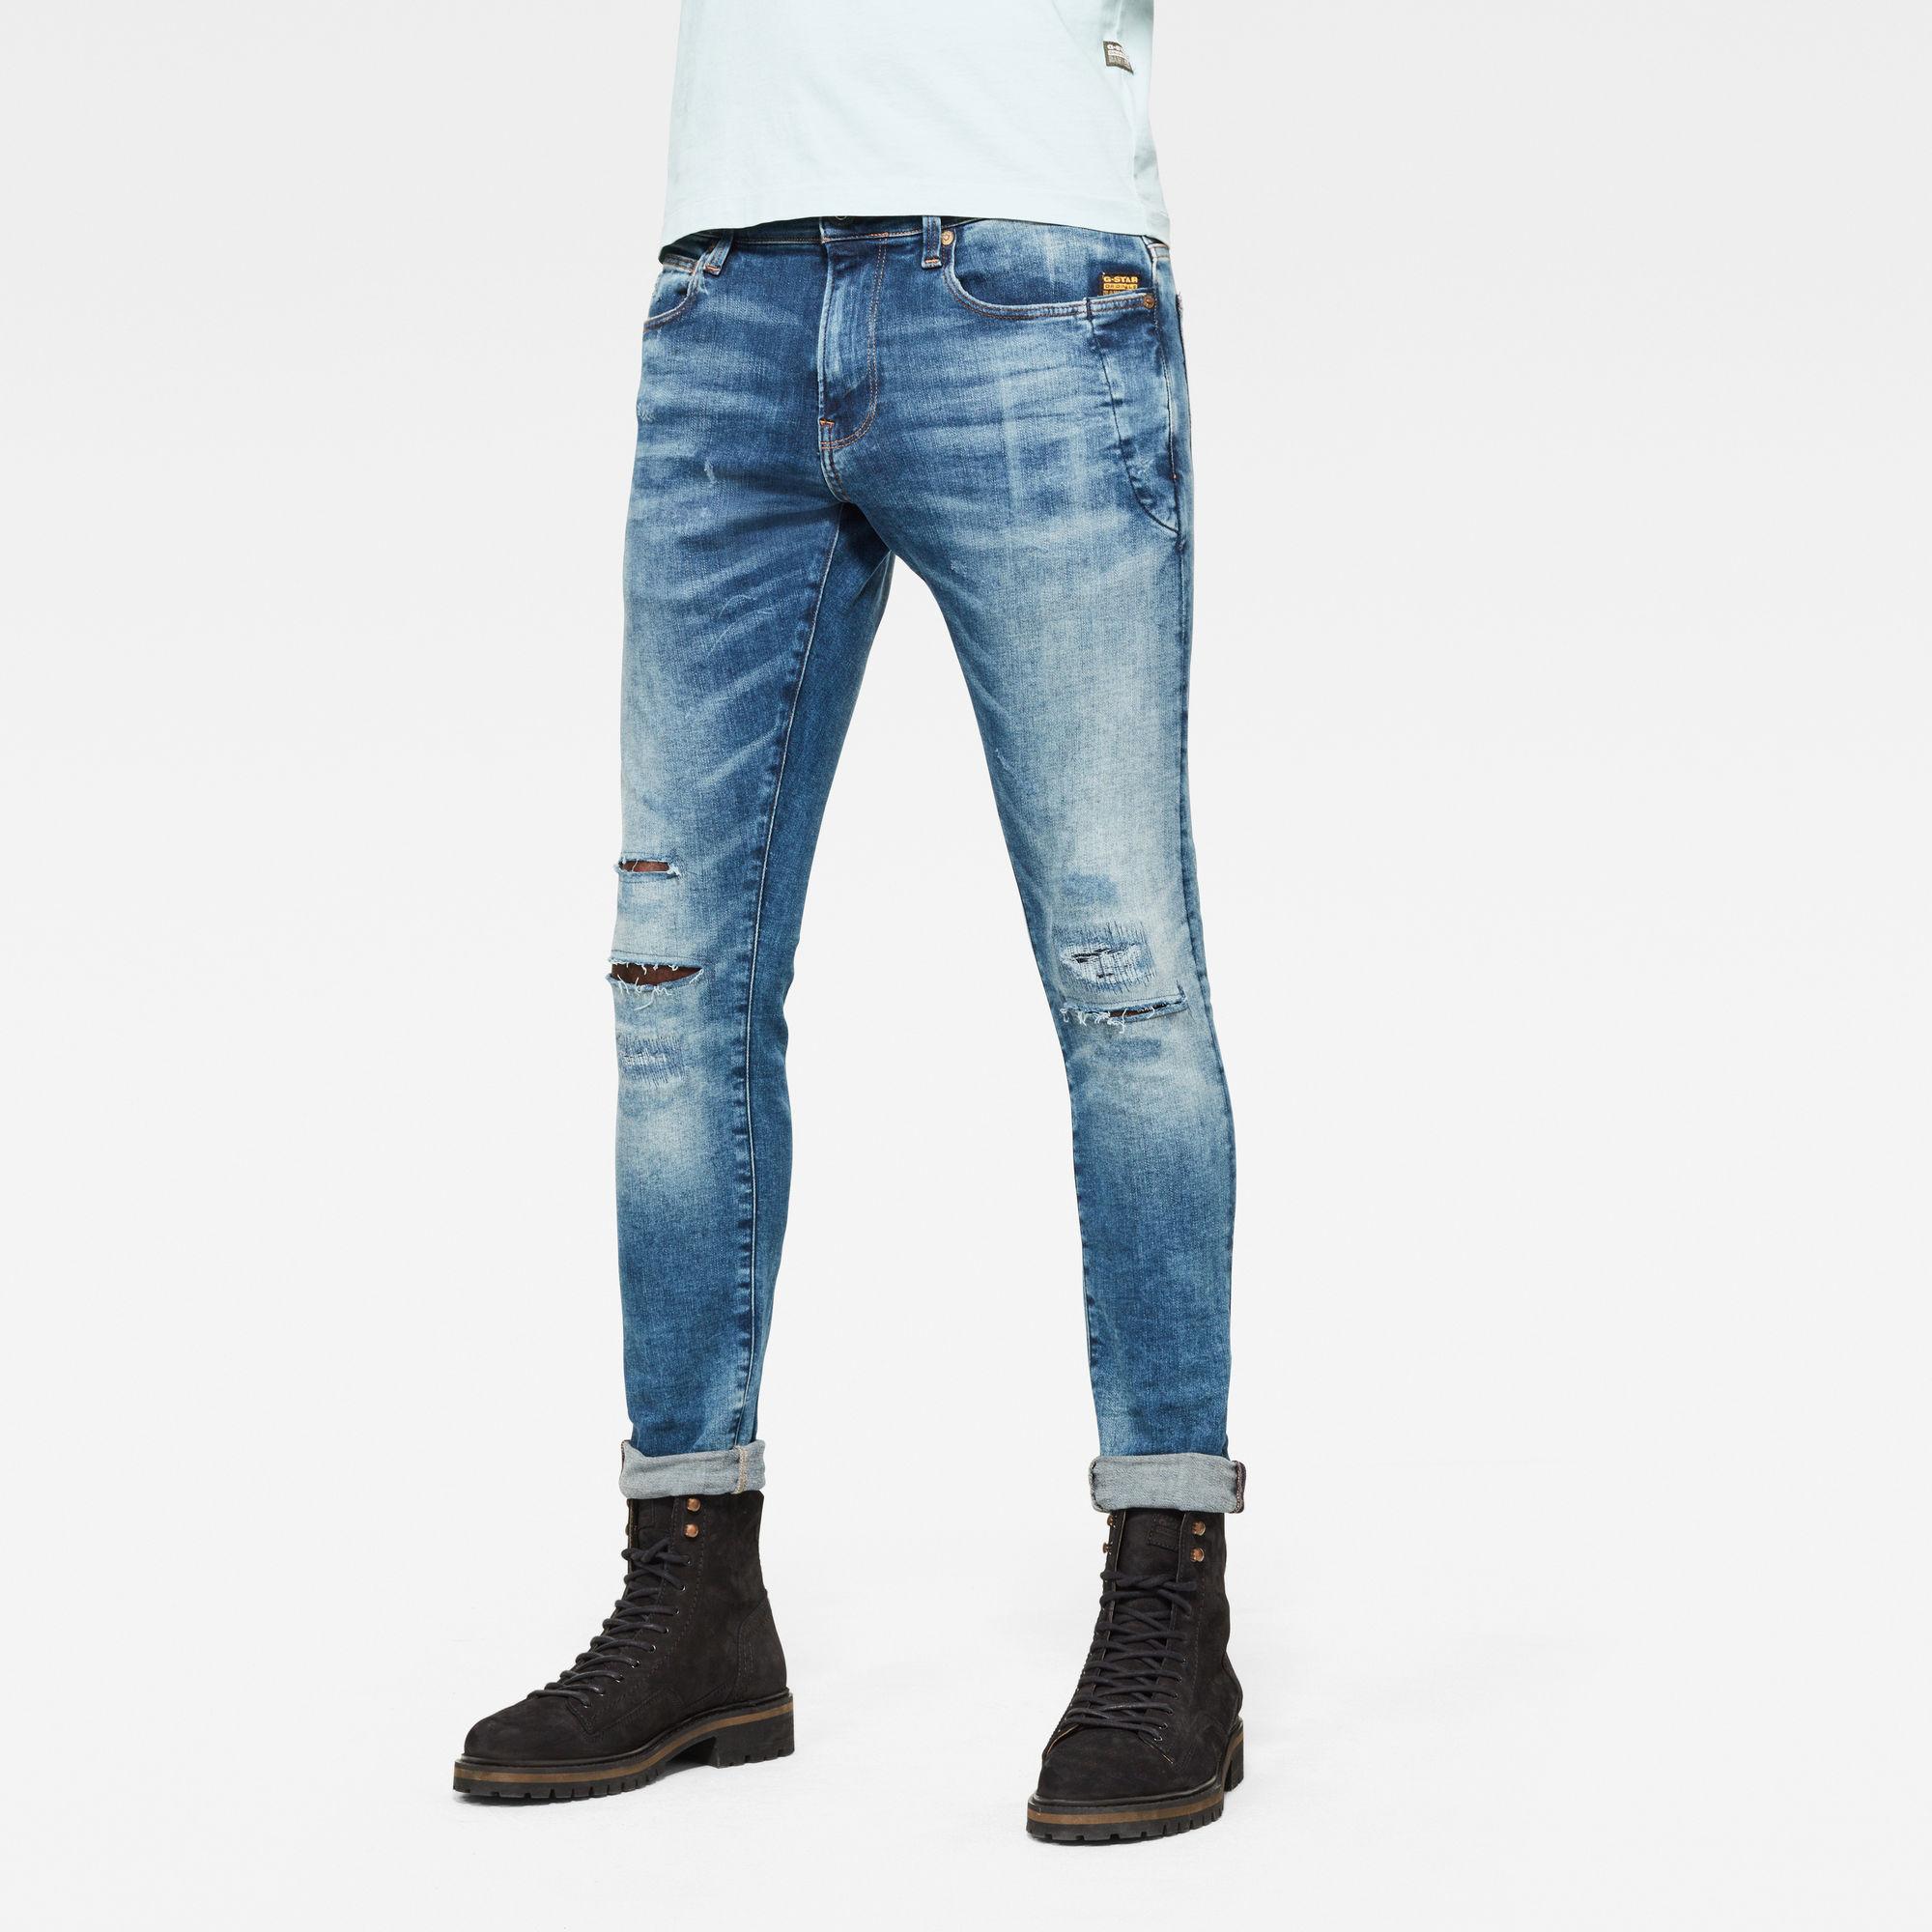 4101 Lancet Skinny Jeans Blauw